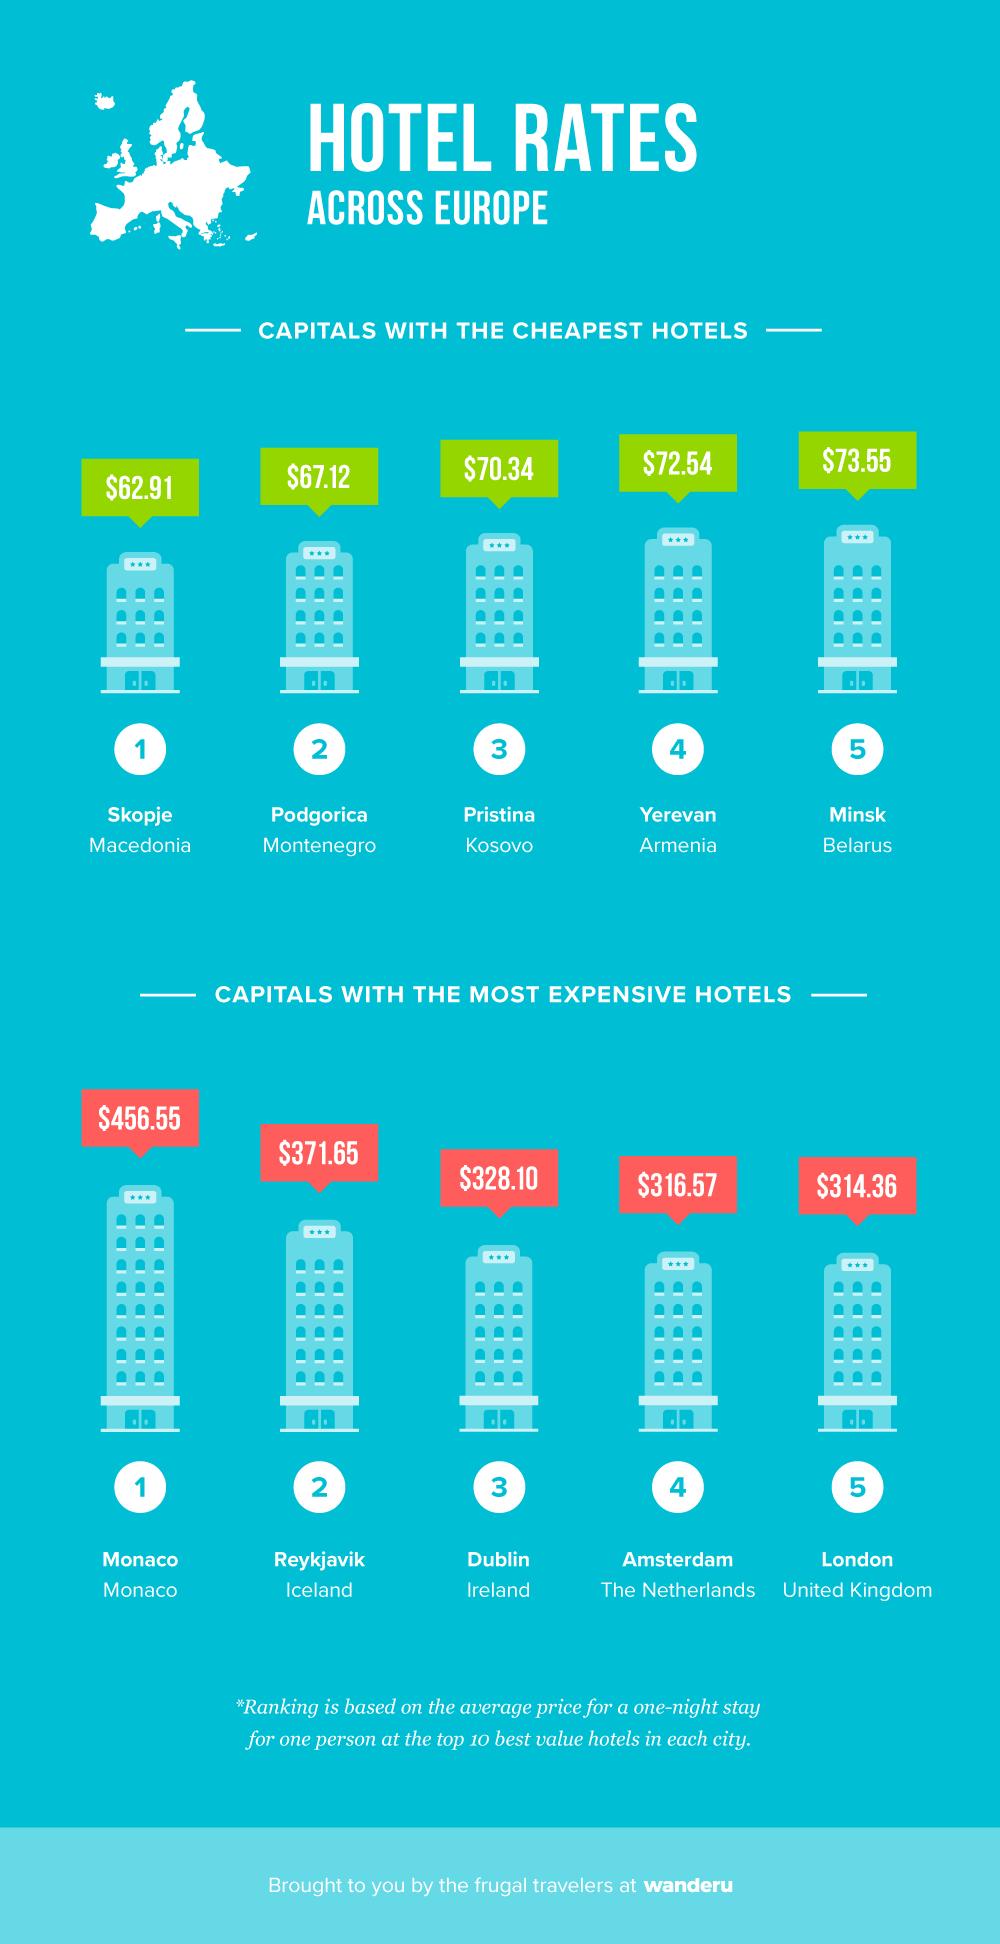 Hotel prices across Europe.